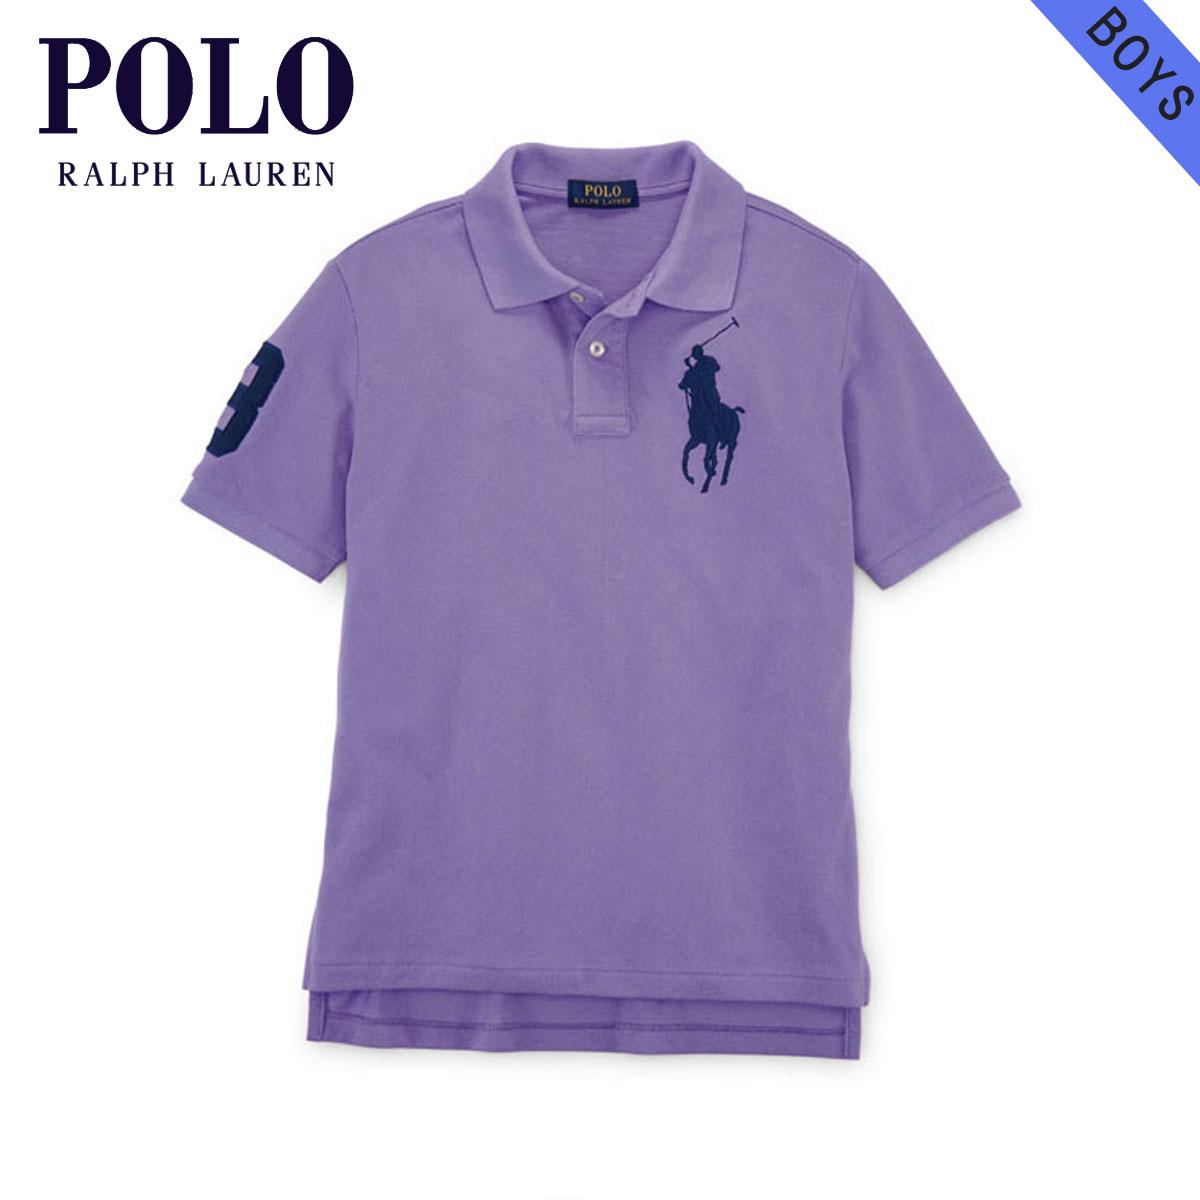 5e235fa07 Polo Ralph Lauren kids POLO RALPH LAUREN CHILDREN regular article children's  clothes boys polo shirt BIG ...